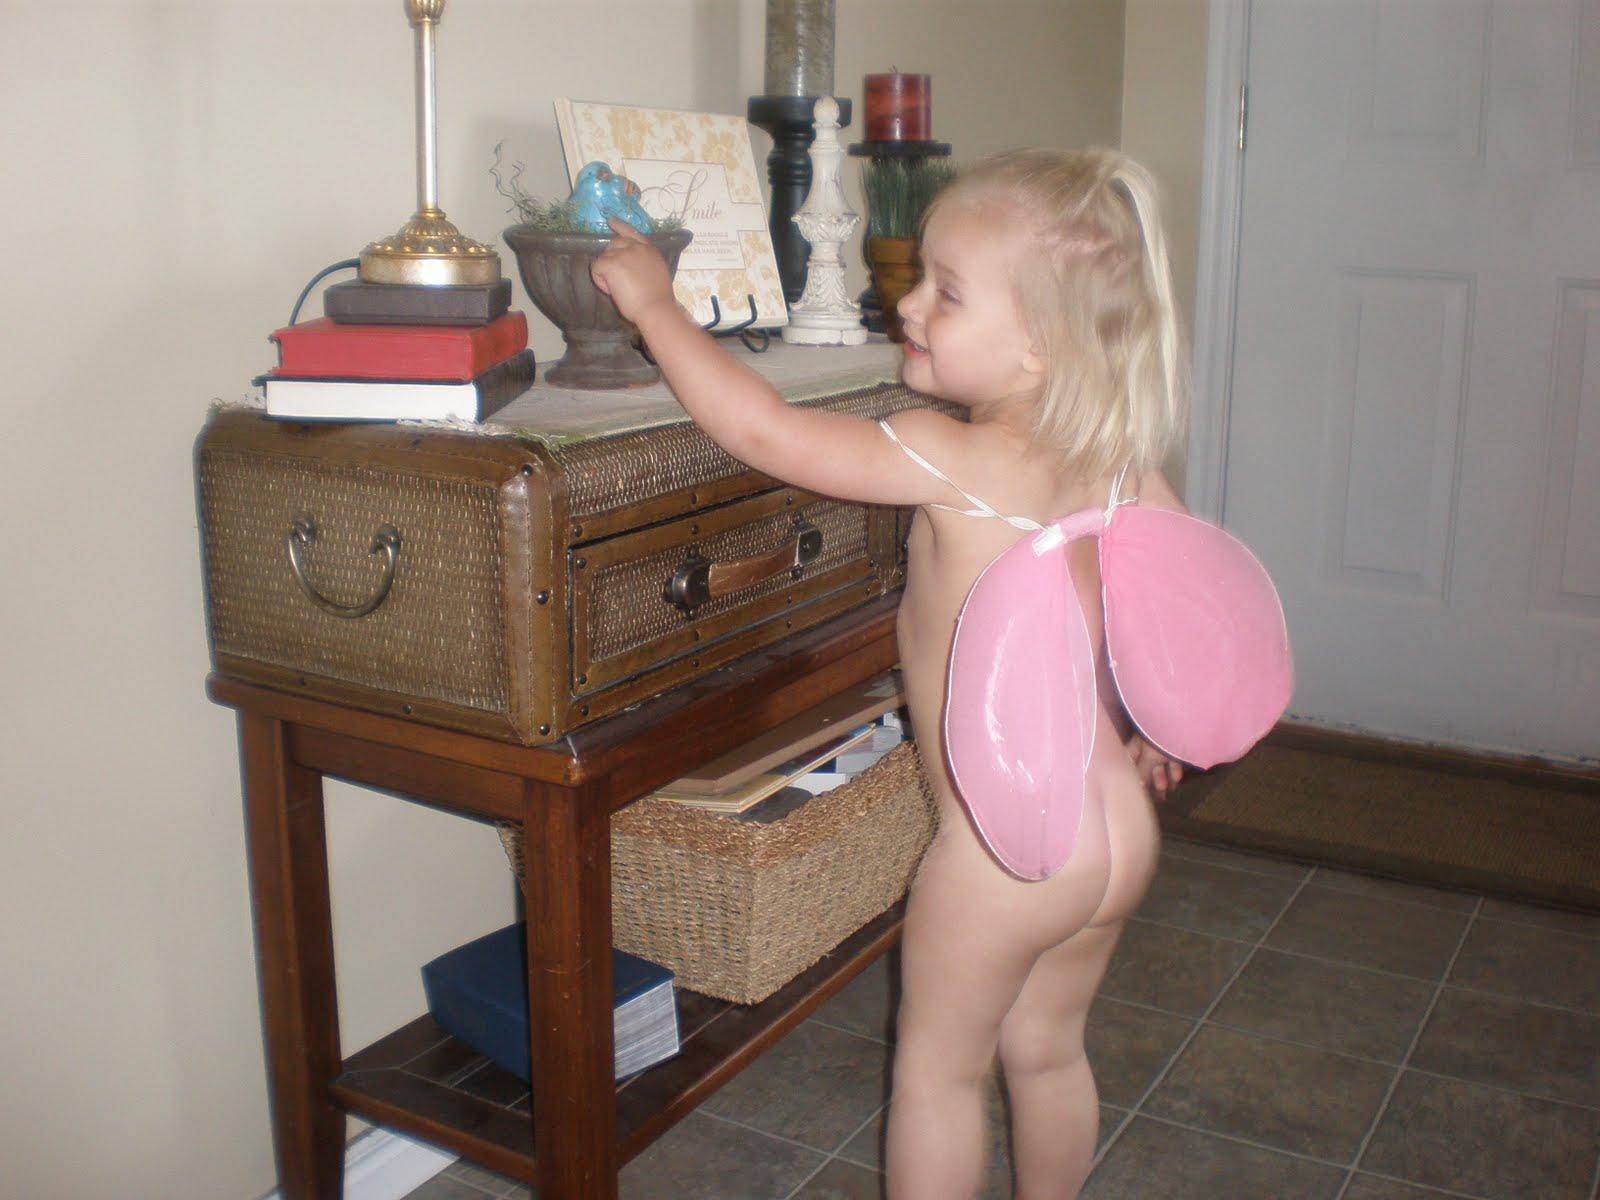 chelsea rae nude pic